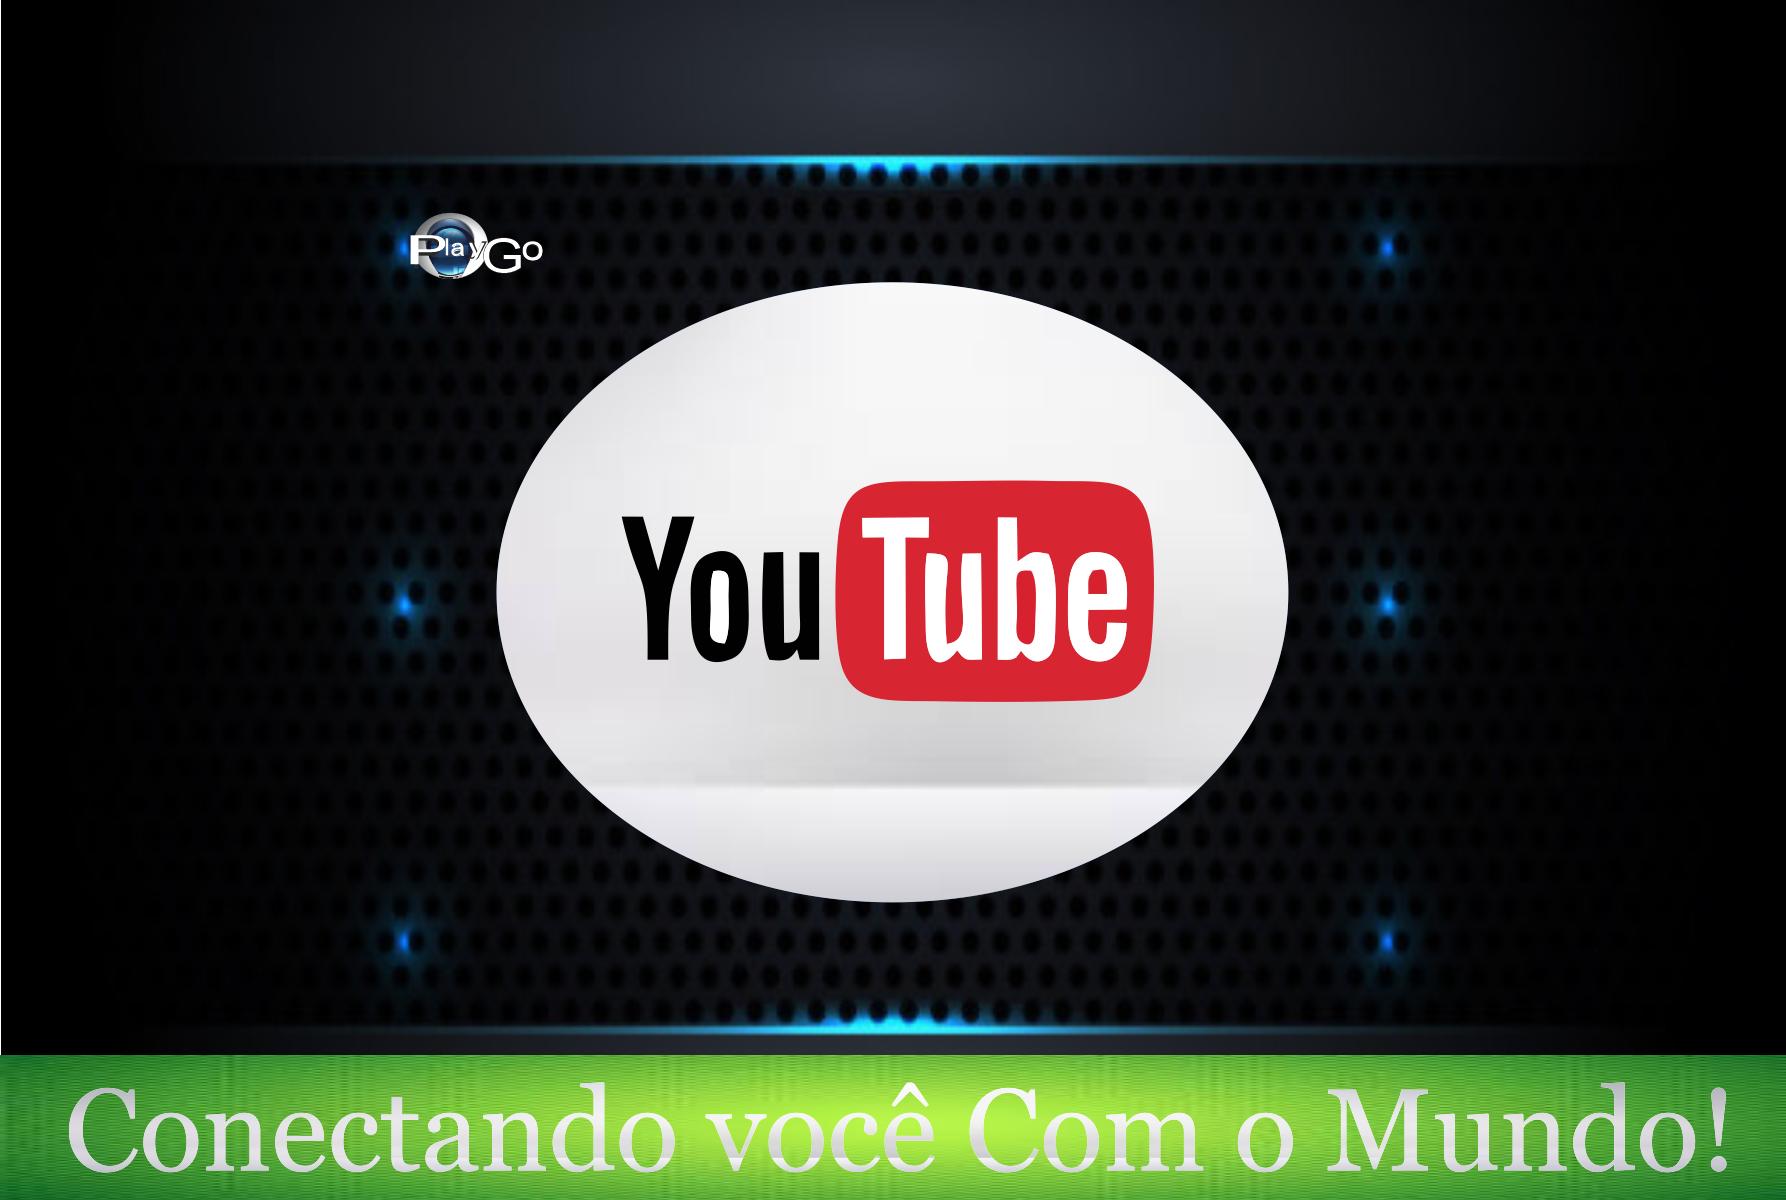 icons-social__item icons-social__item--youtube